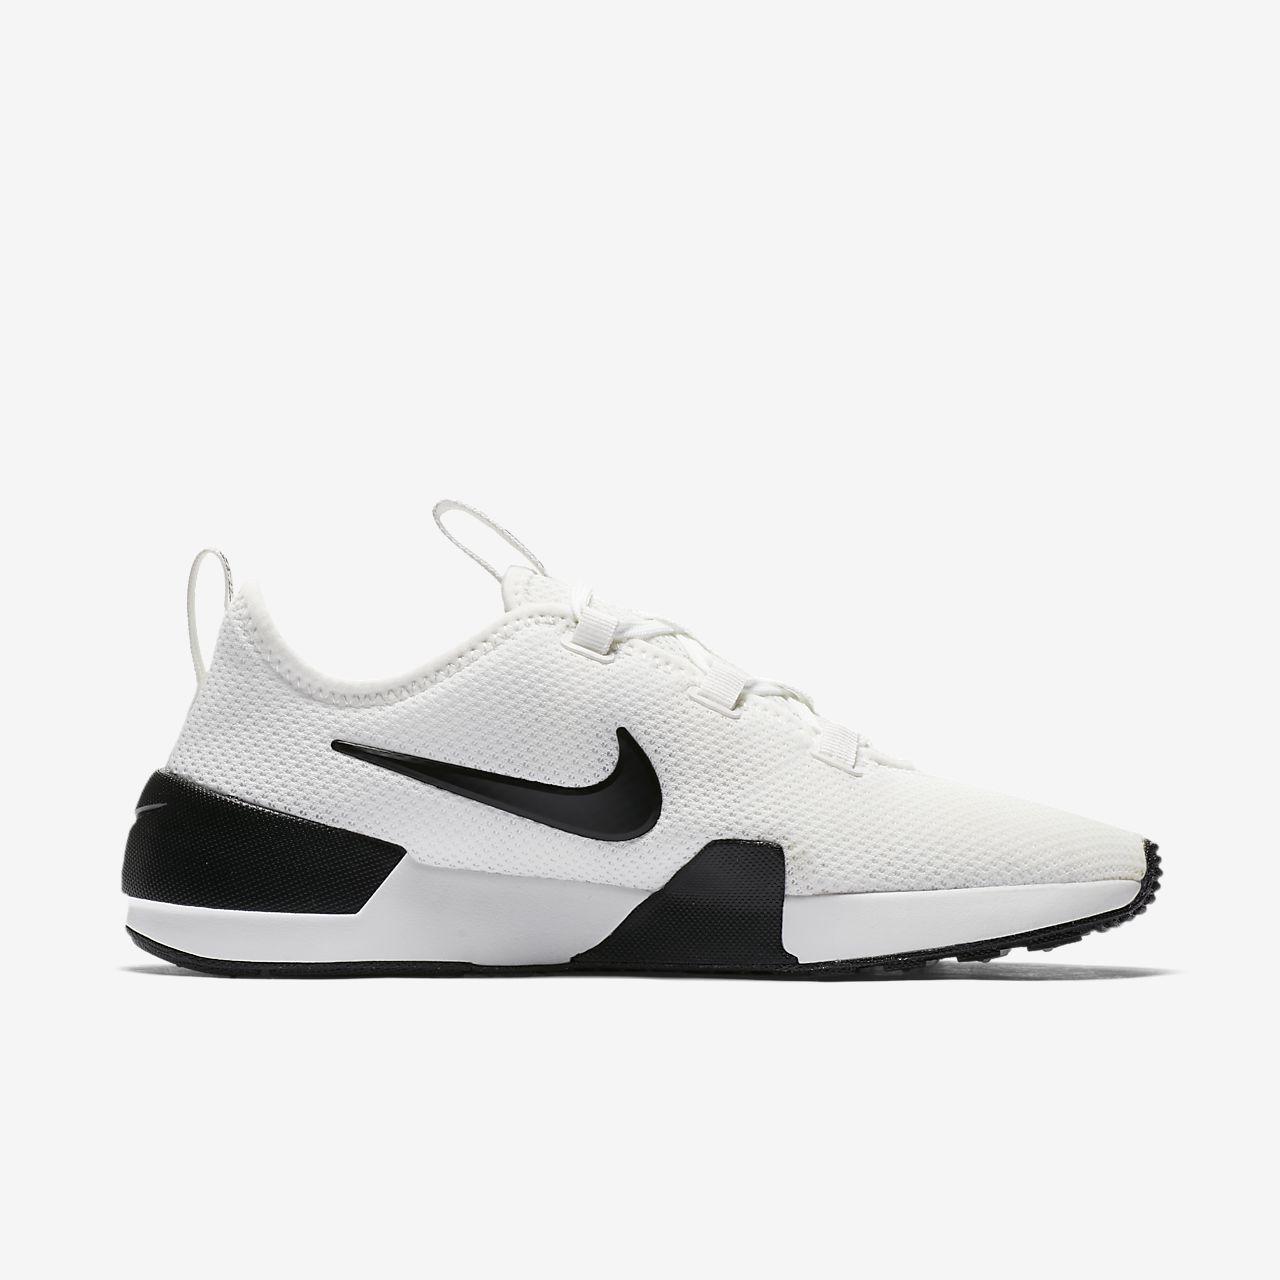 super popular a7165 dc135 ... Nike Ashin Modern Run Womens Shoe